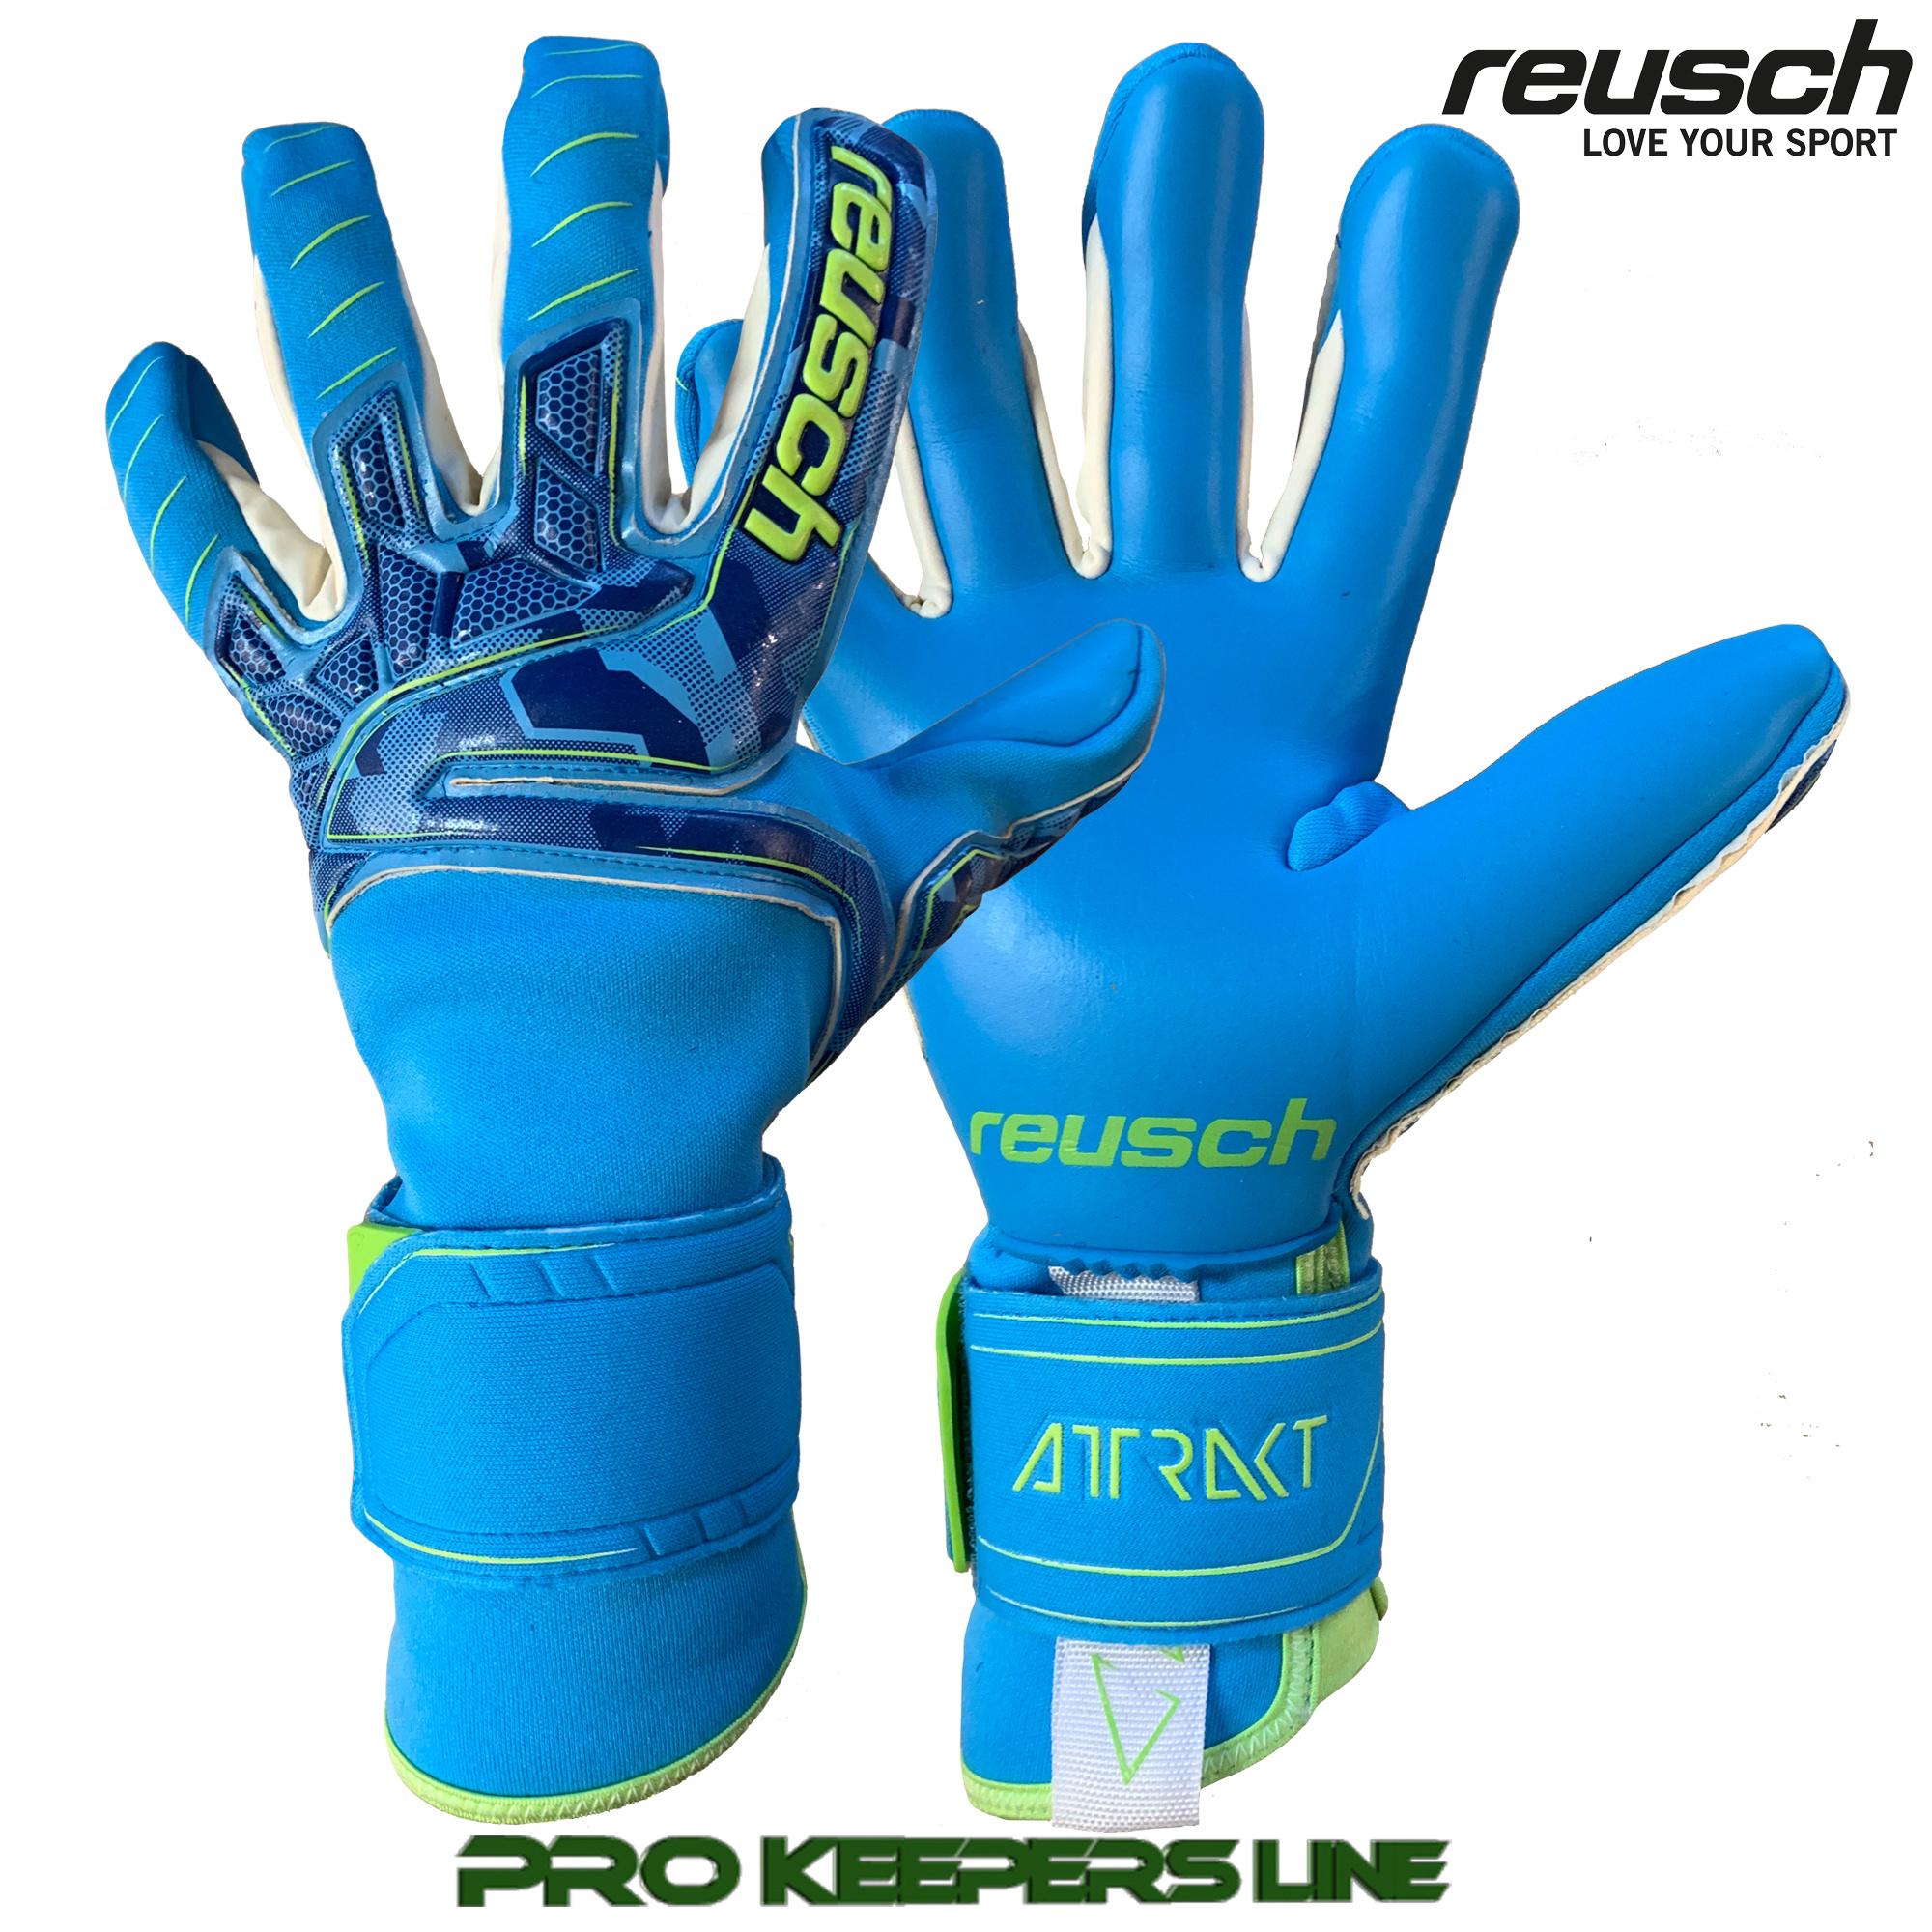 Reusch Attrakt Pro Ax2 Evolution Nc Ortho-tec Goalkeeper Gloves